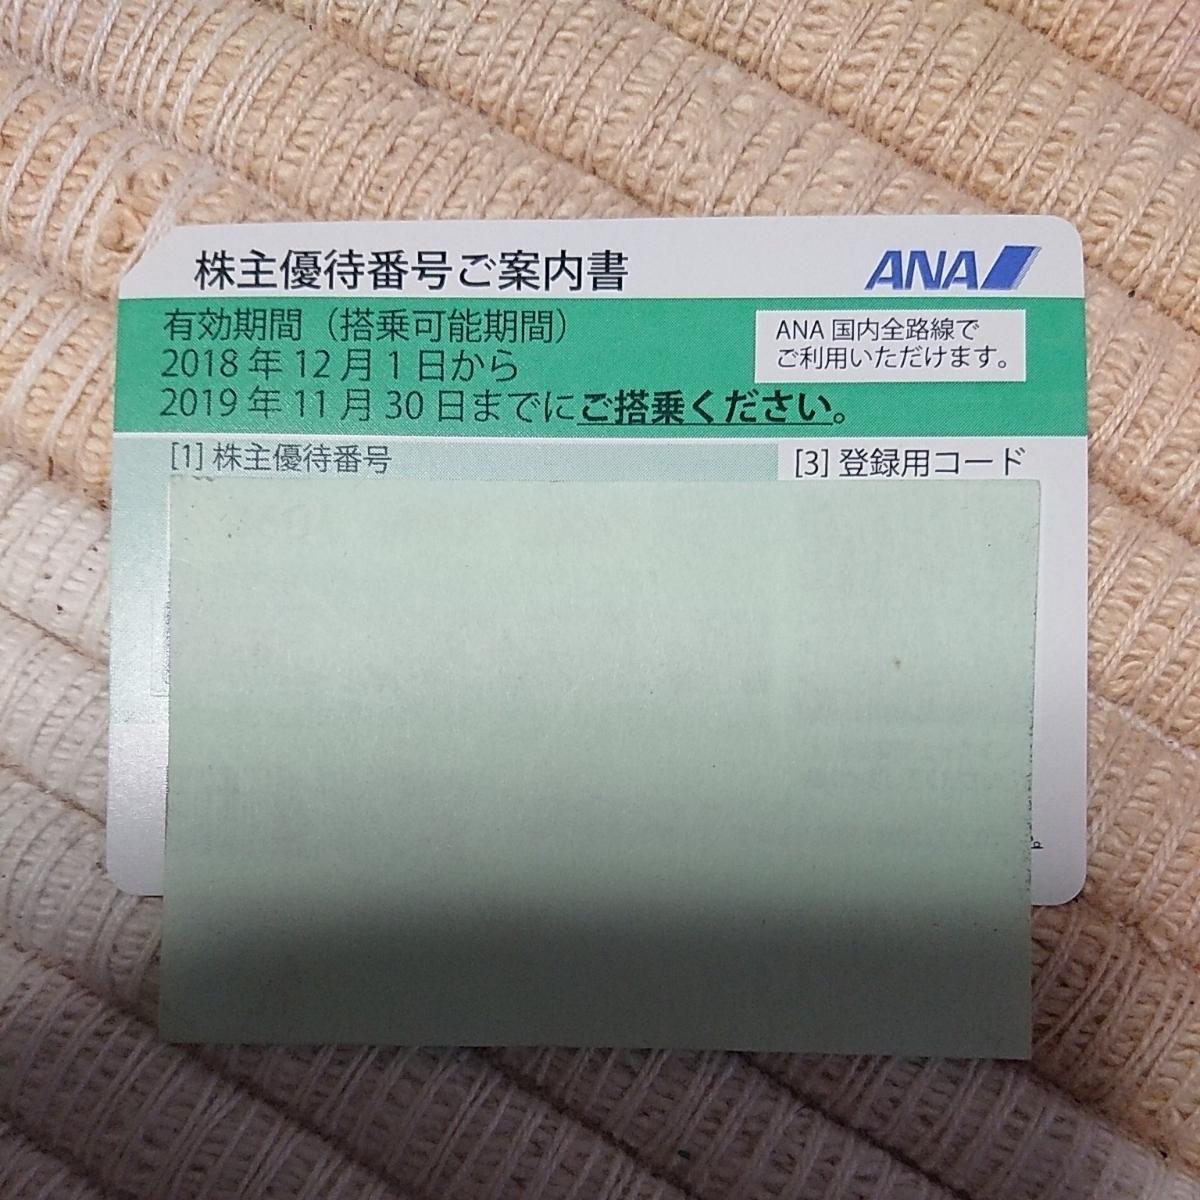 ANA全日空株主優待券